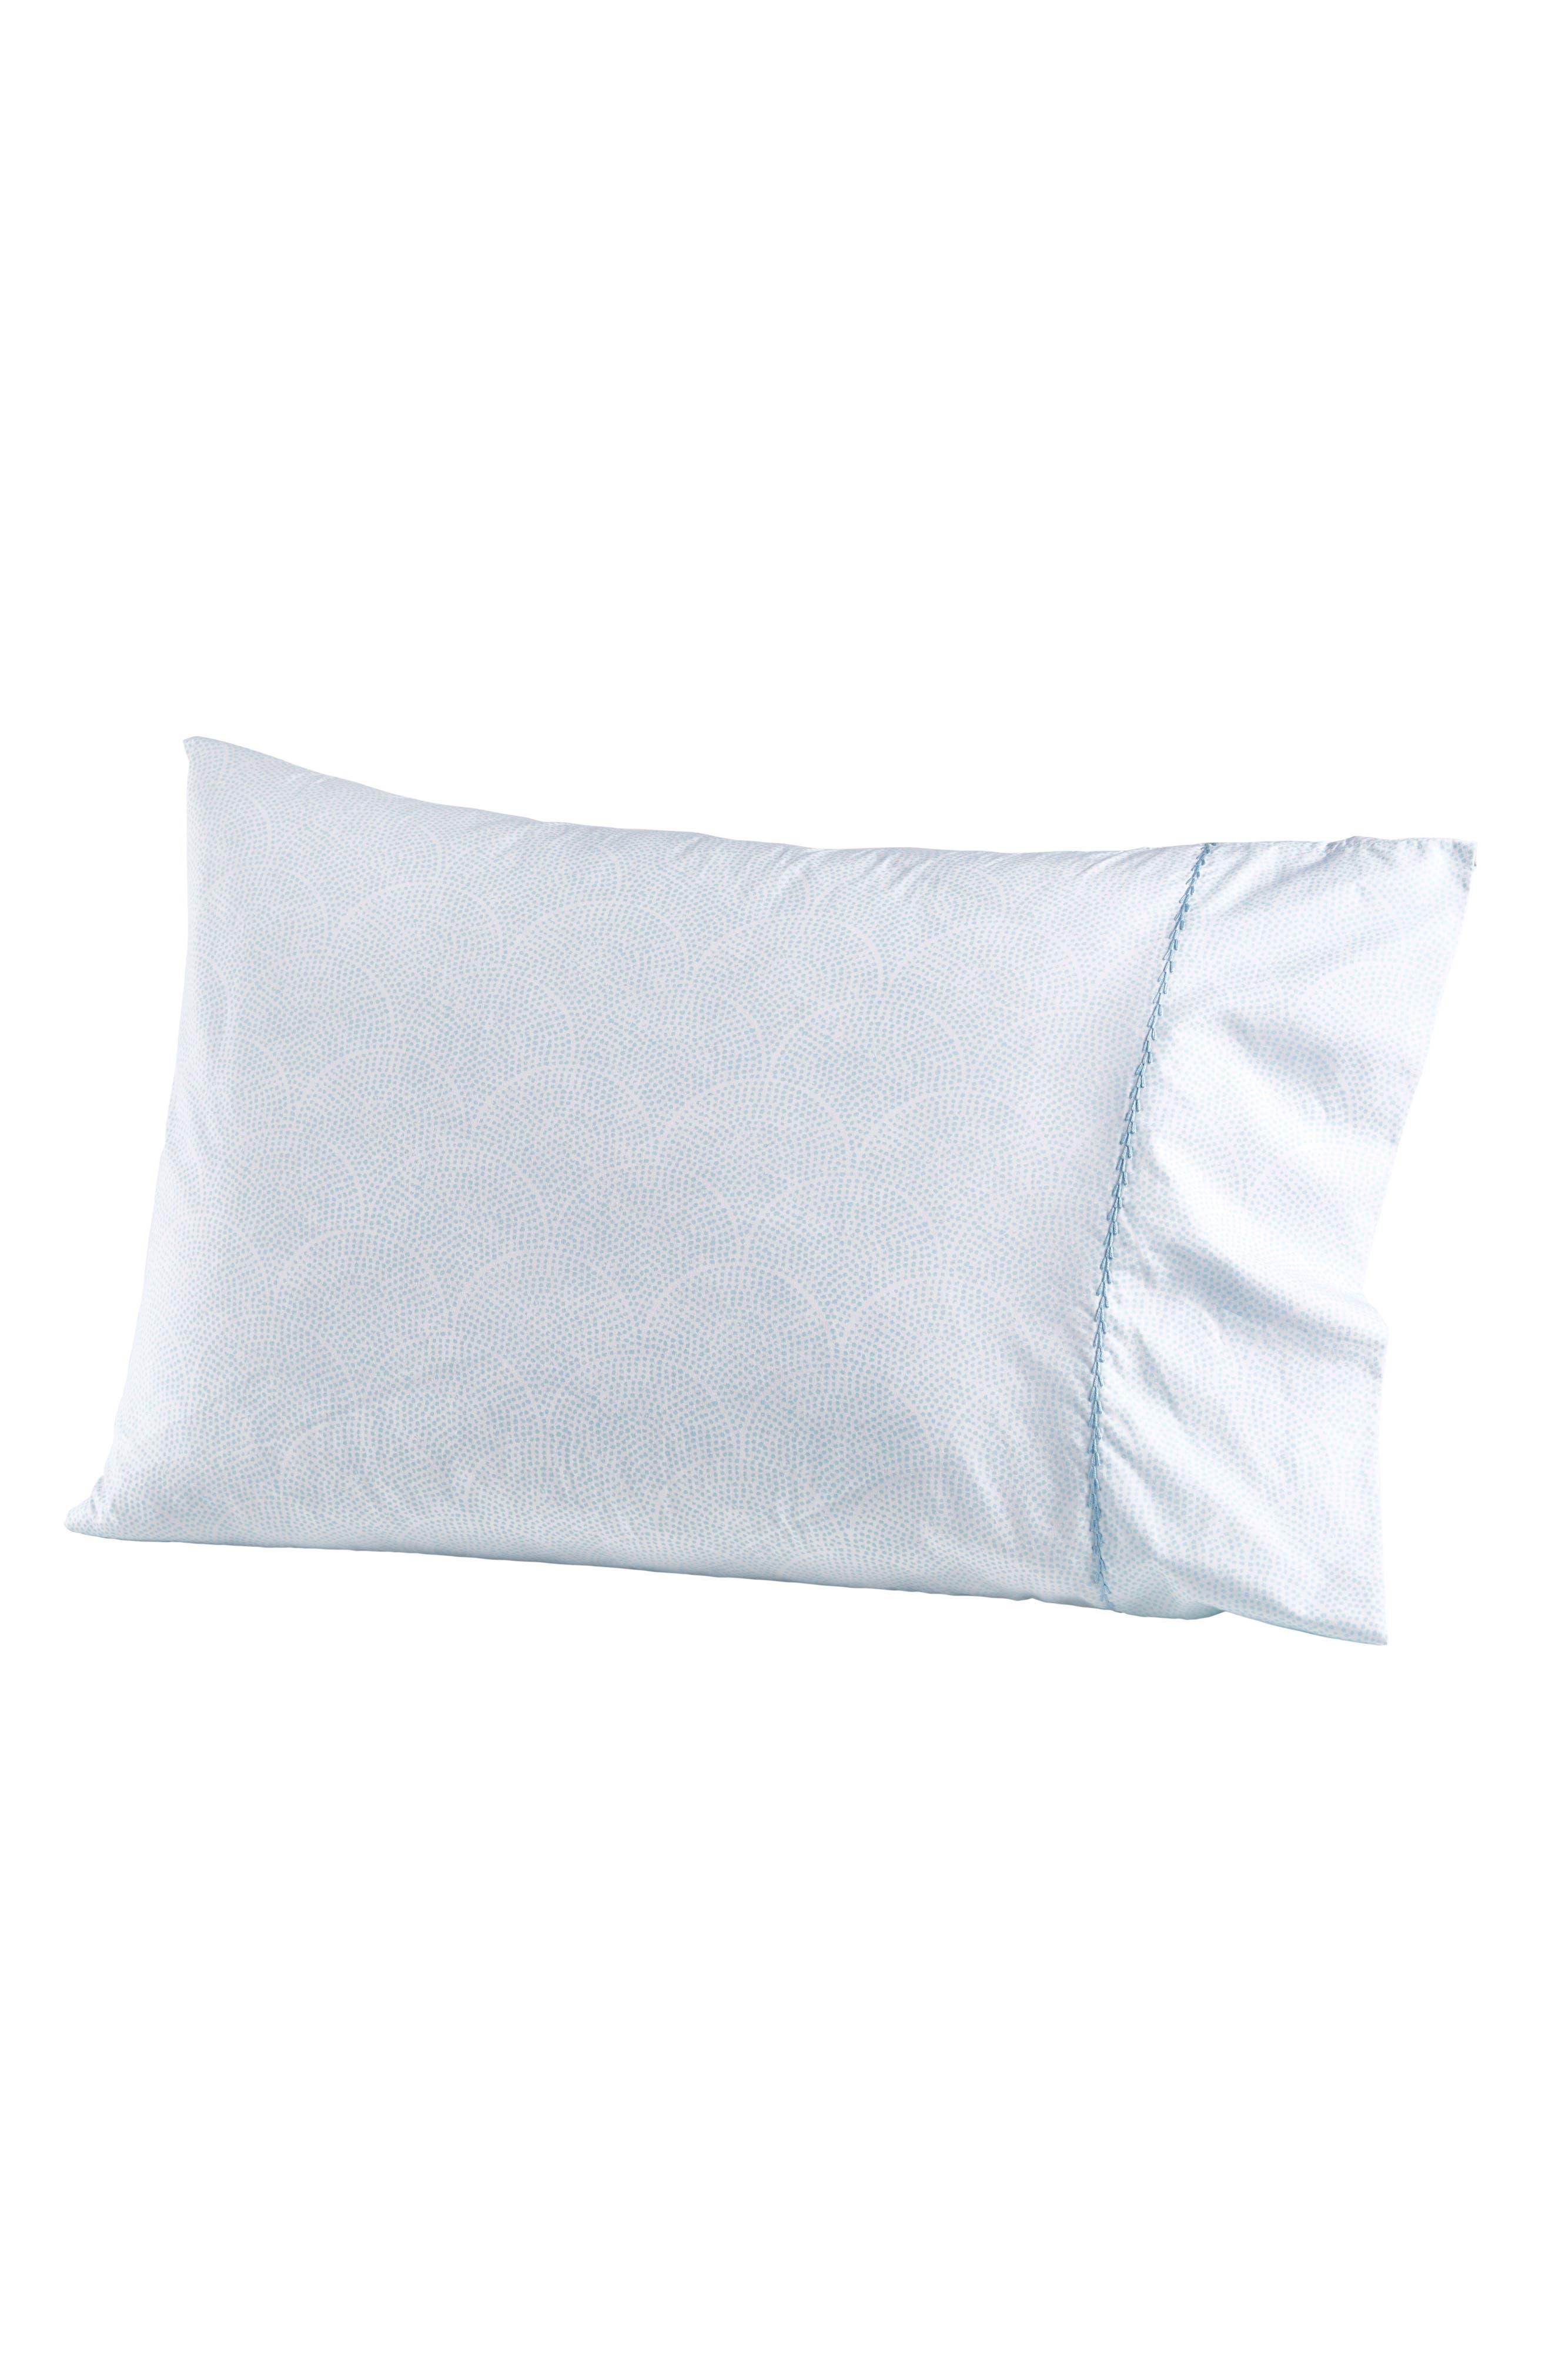 Vatula 400 Thread Count Pillowcases,                         Main,                         color, 100